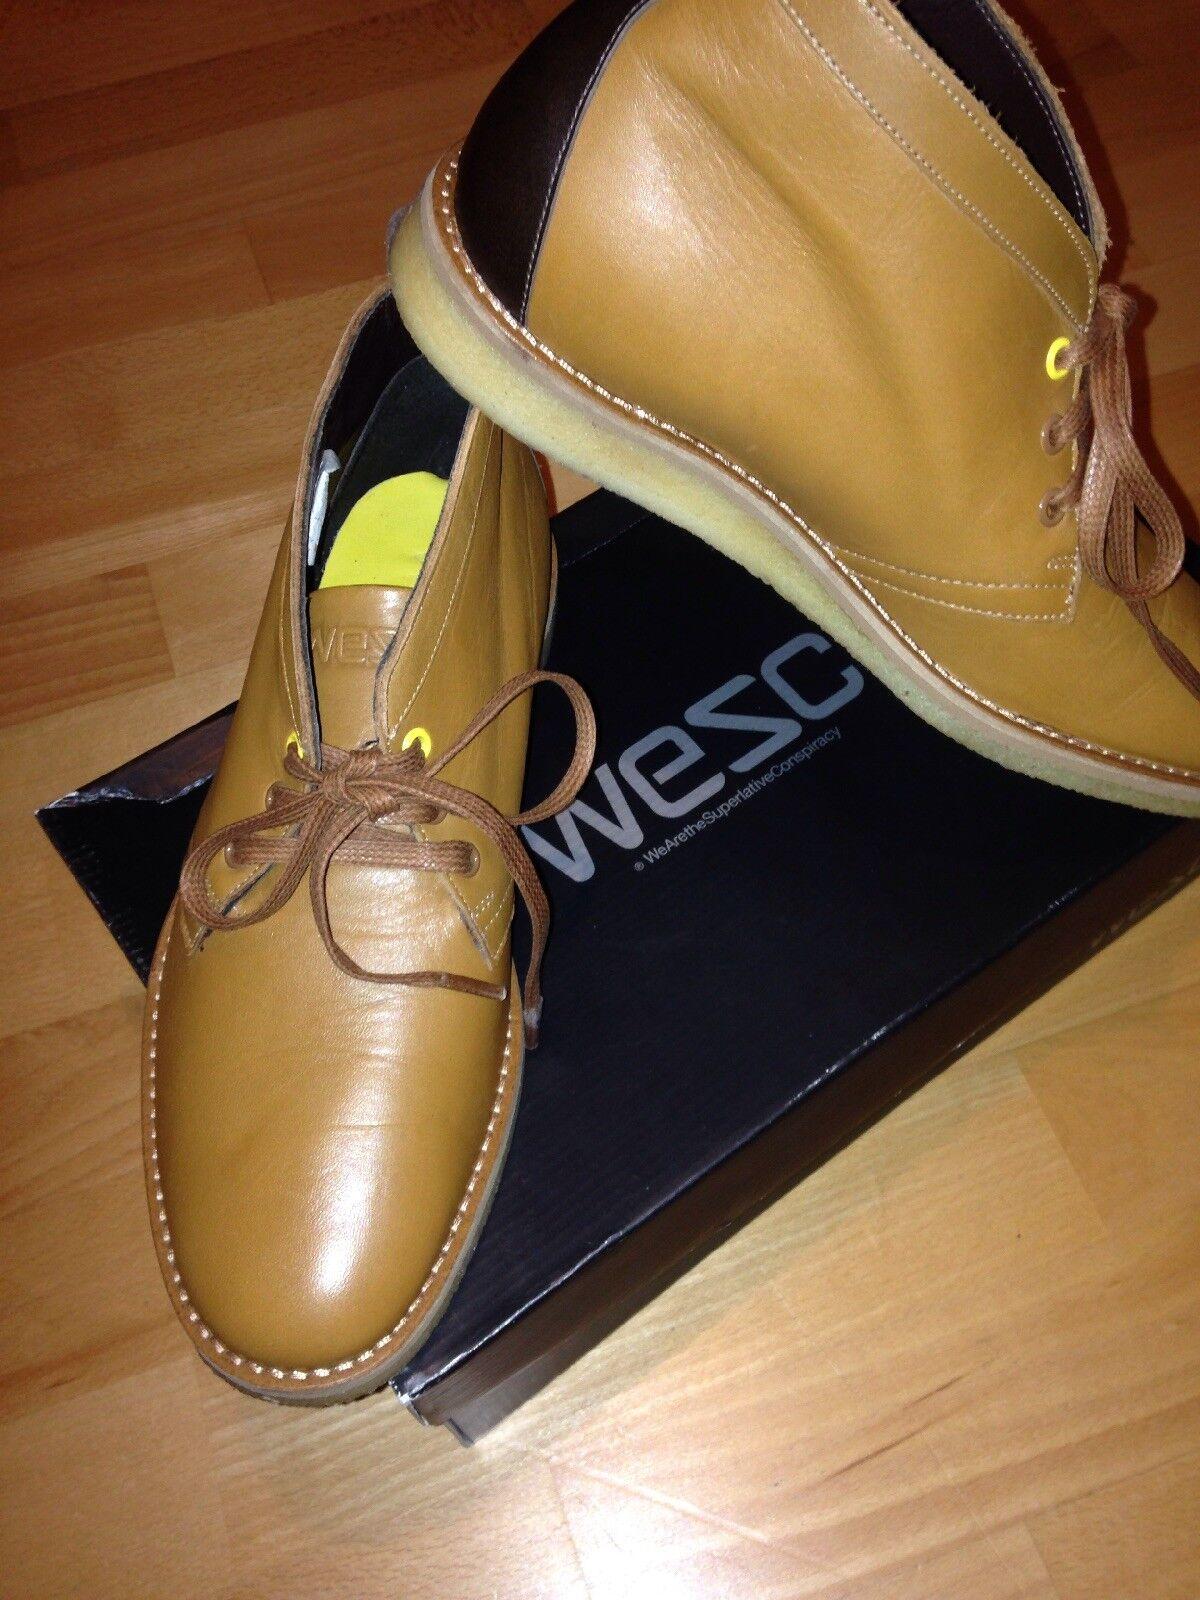 WESC, Sneaker, Gr. 41, Mod.: Lawrence, Farbe: Walnut, Rindleder, handmade, Neu